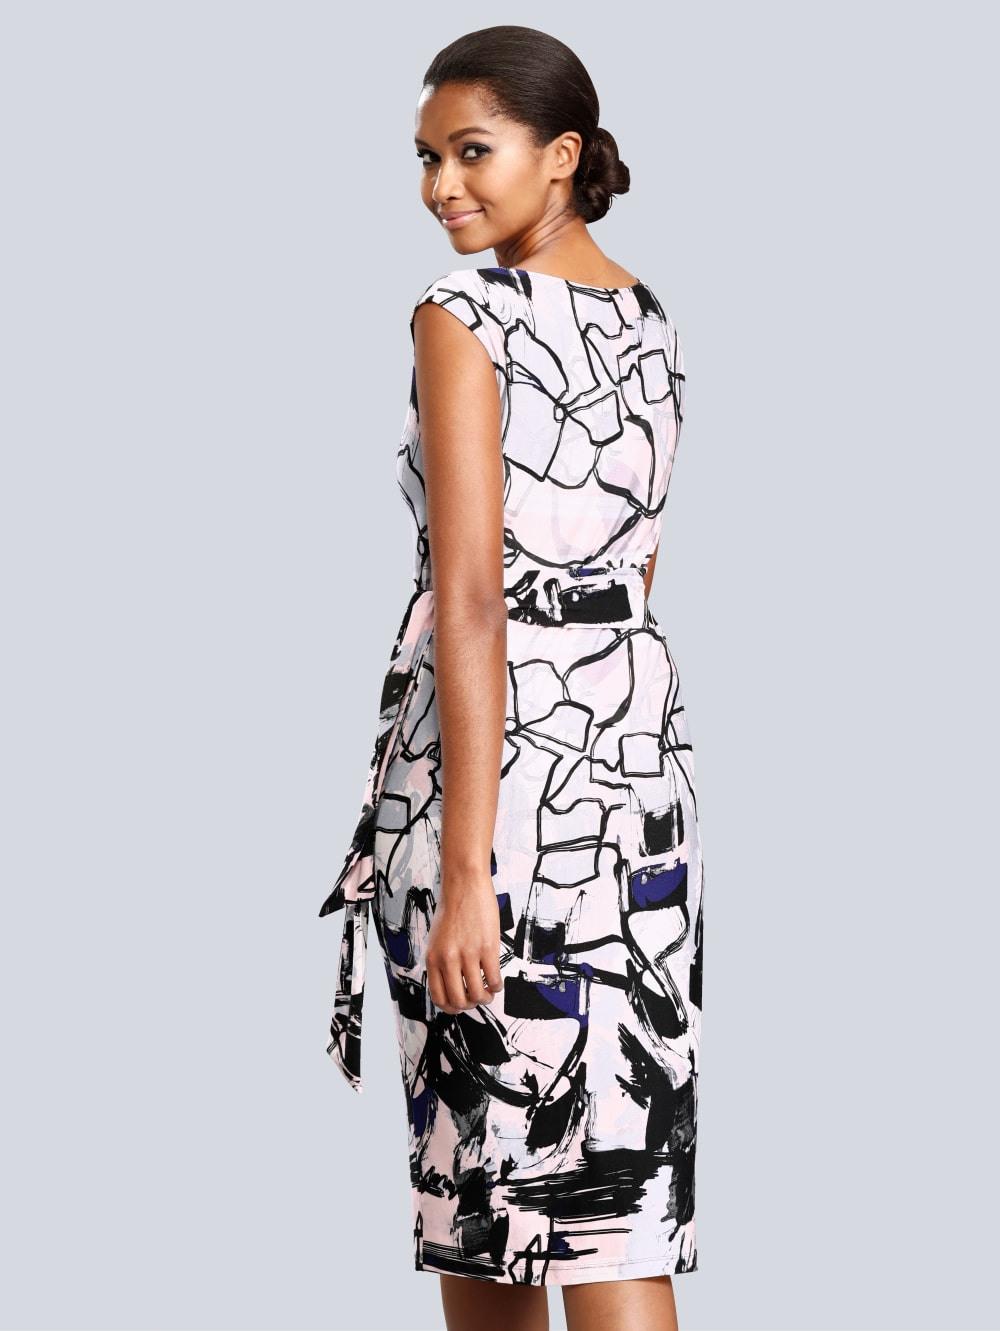 Alba Moda Kleid Mit Allover Grafik-Dessin | Alba Moda